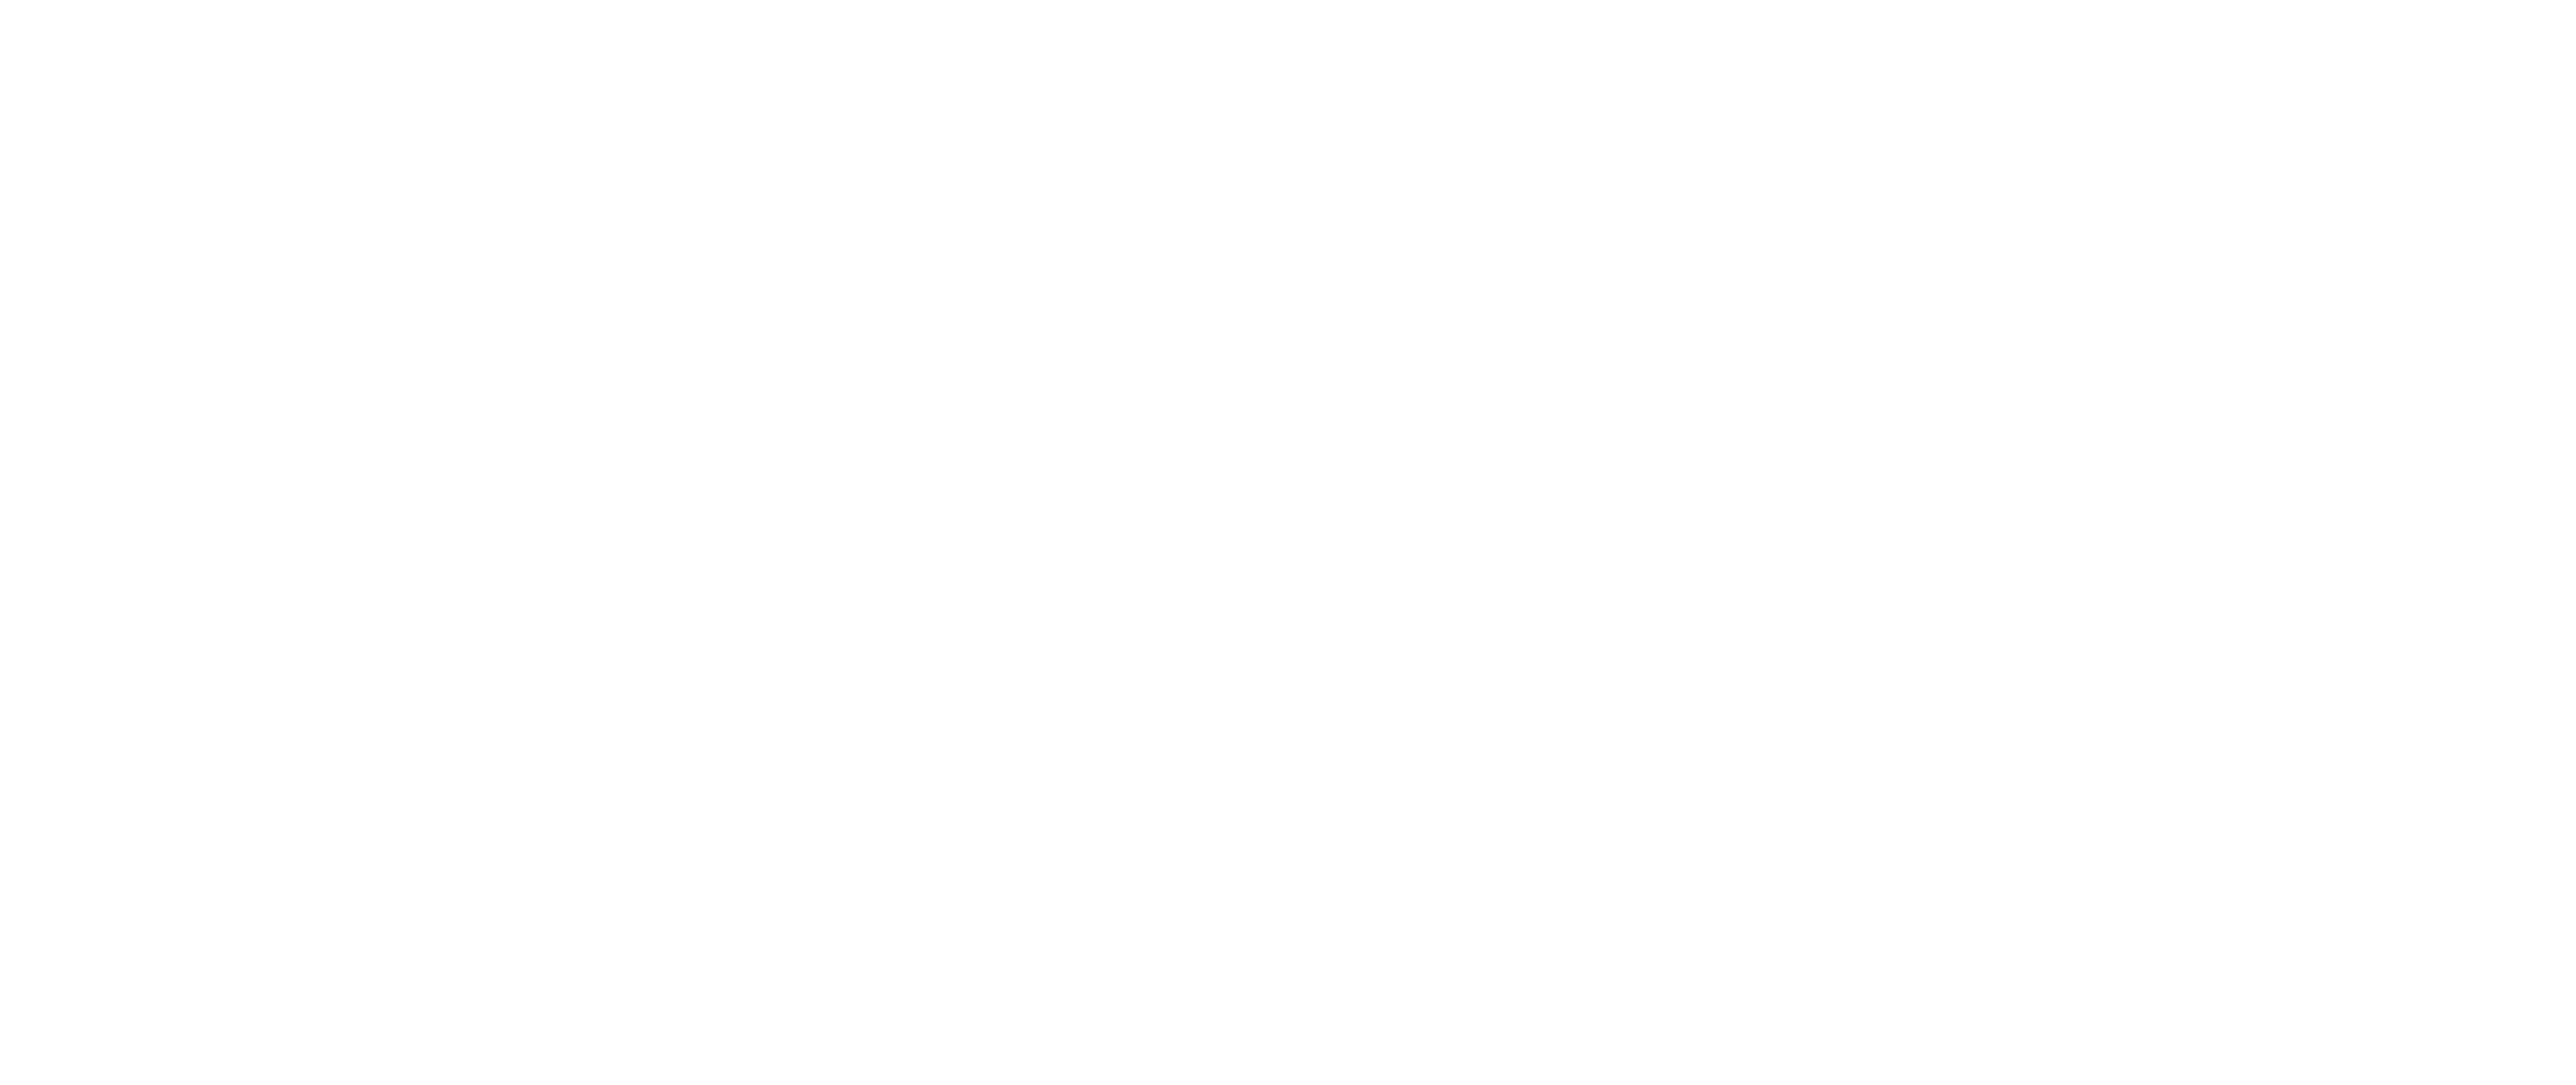 watch the videos BIG